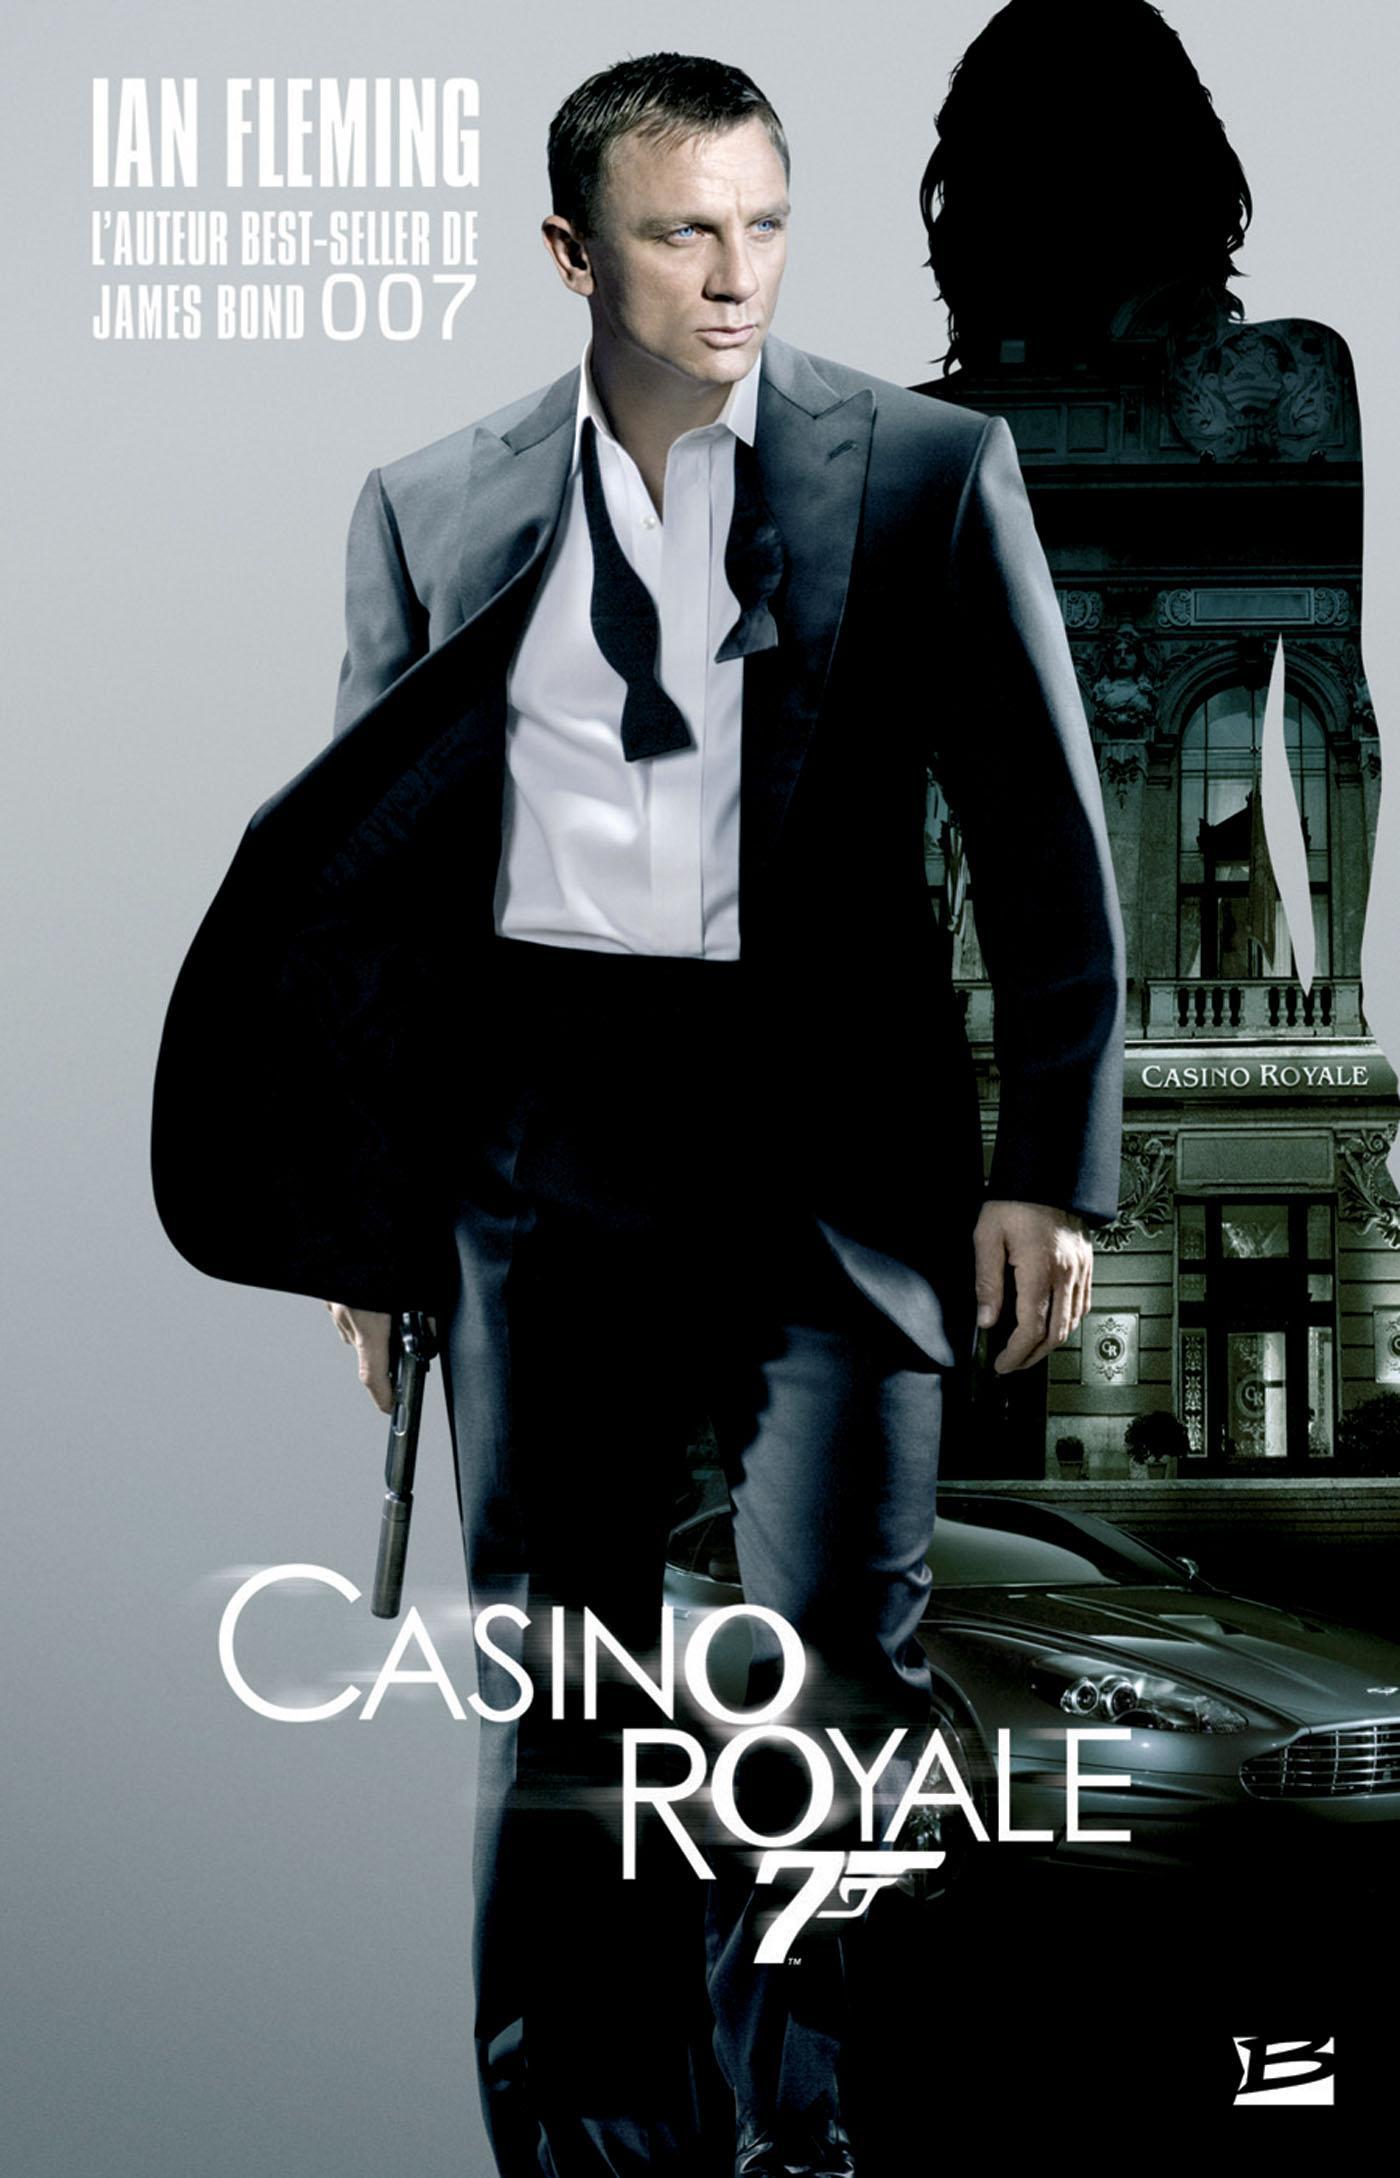 Casino Royale, JAMES BOND 007